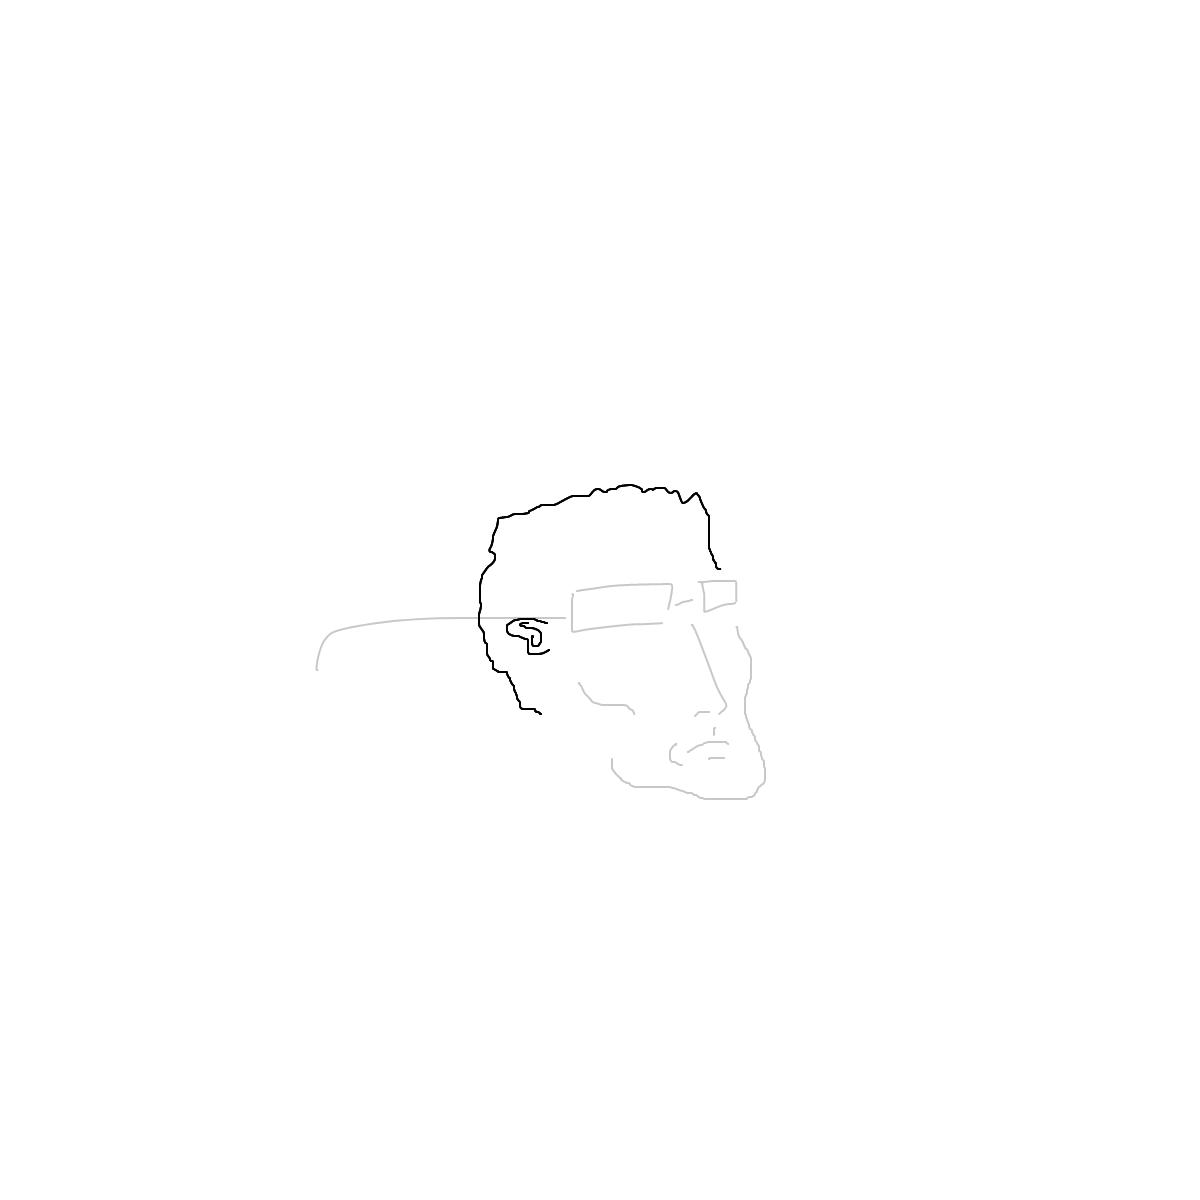 BAAAM drawing#23620 lat:45.7998580932617200lng: 15.9283609390258790